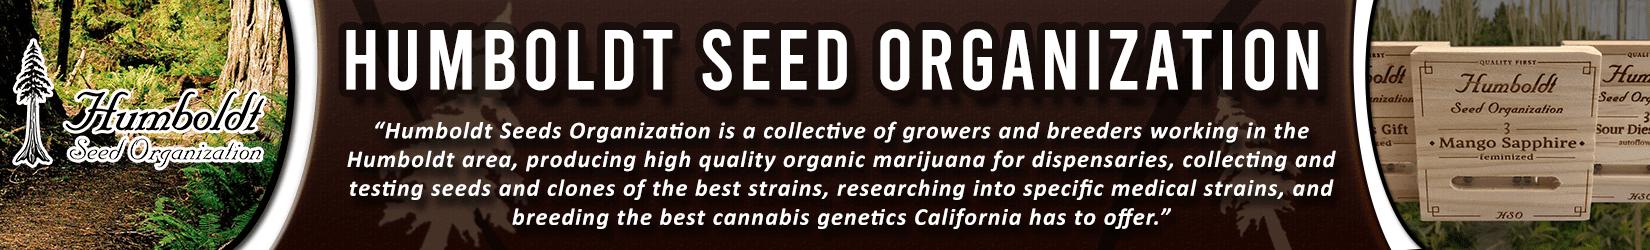 Cannabis Seeds Breeder - Humboldt Seed Organization